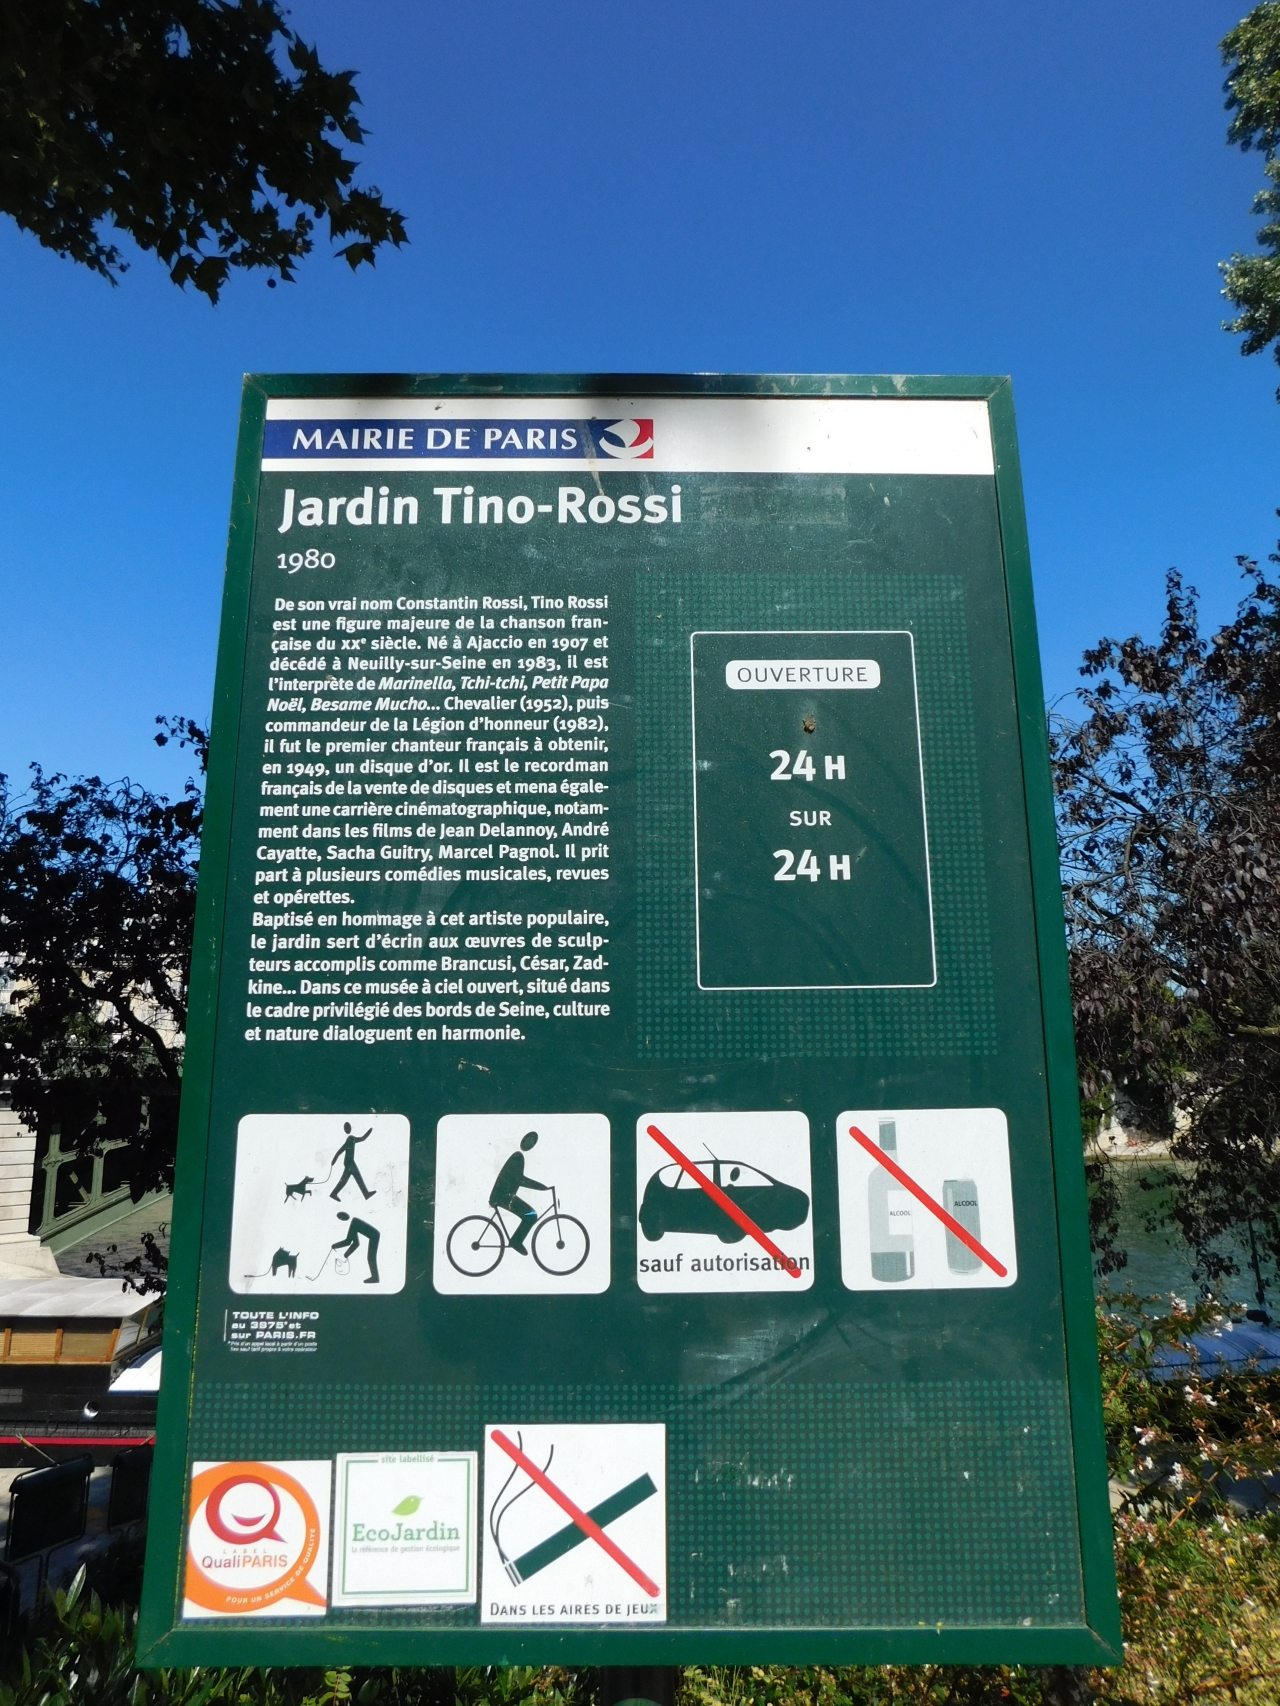 Superbe Jardin Tino Rossi Quai Saint Bernard #5: Big_artfichier_815245_6057241_201608272342201.jpg